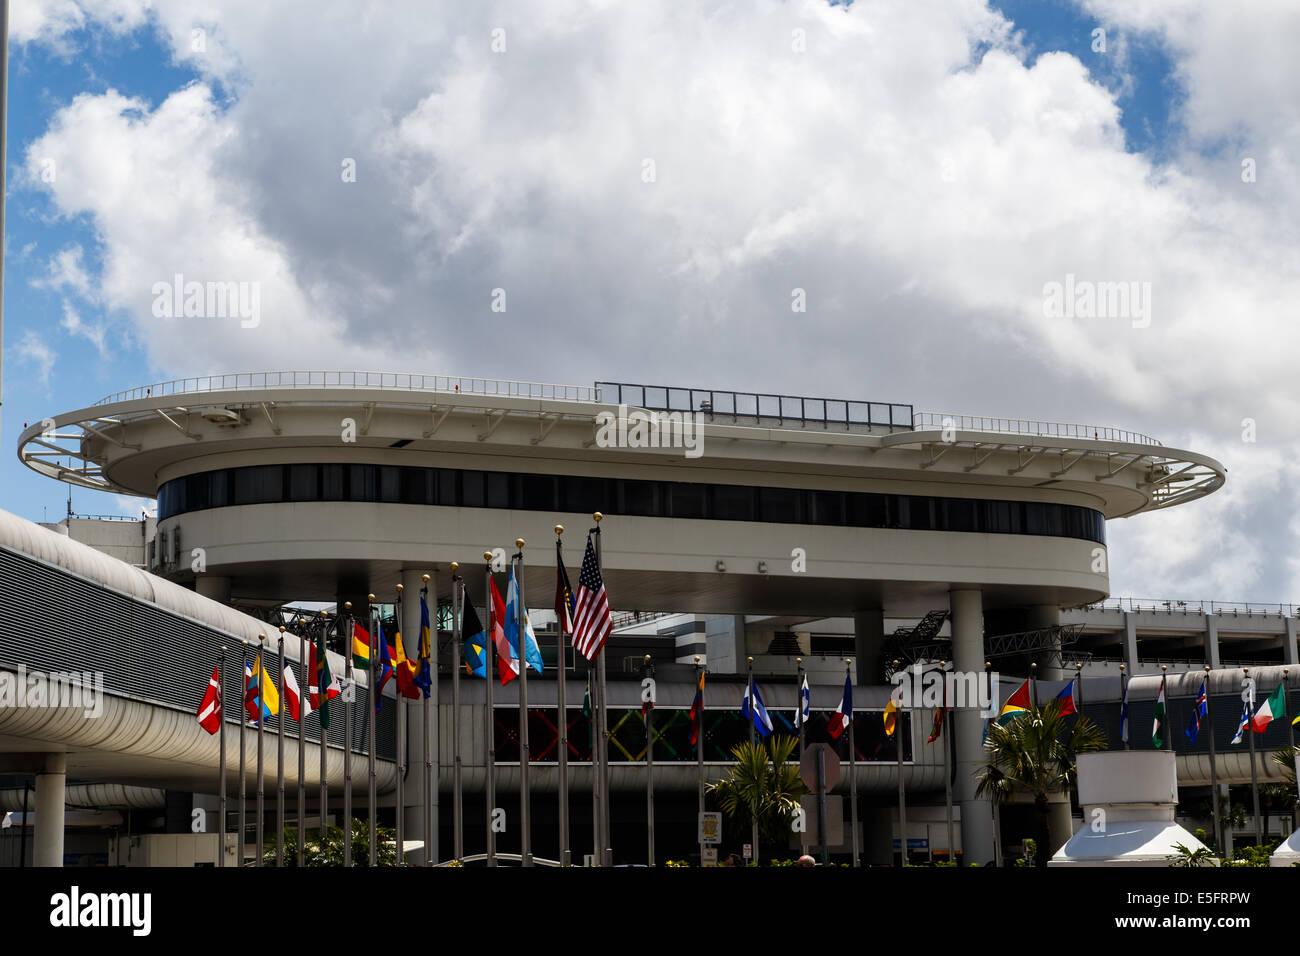 miami airport - Stock Image